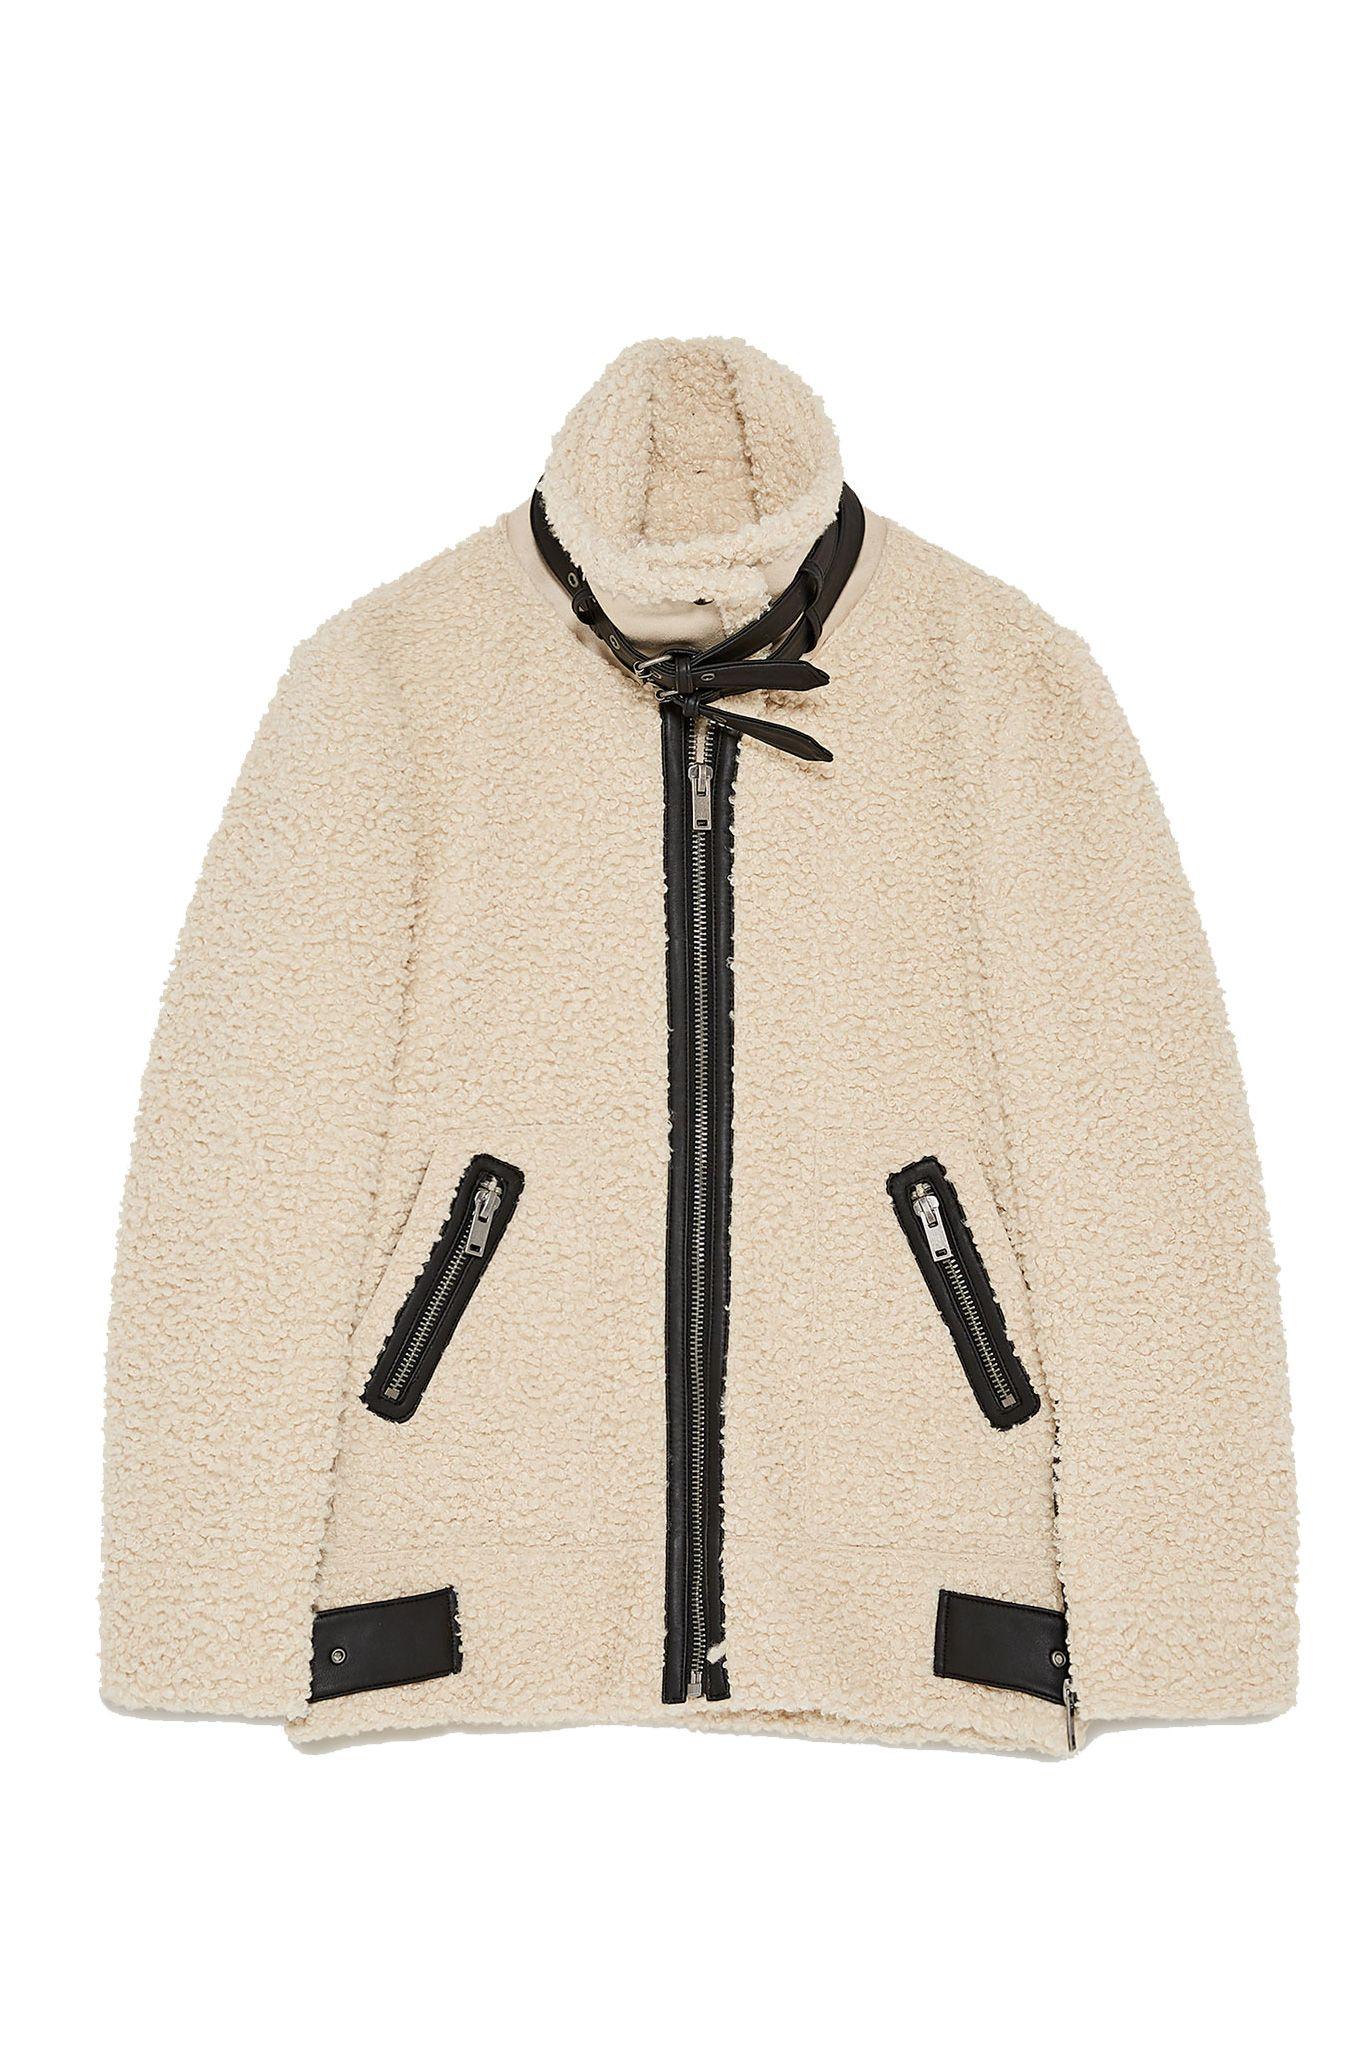 e01ad2edb Teddy Bear Faux Shearling Coats - Faux Fur Coats